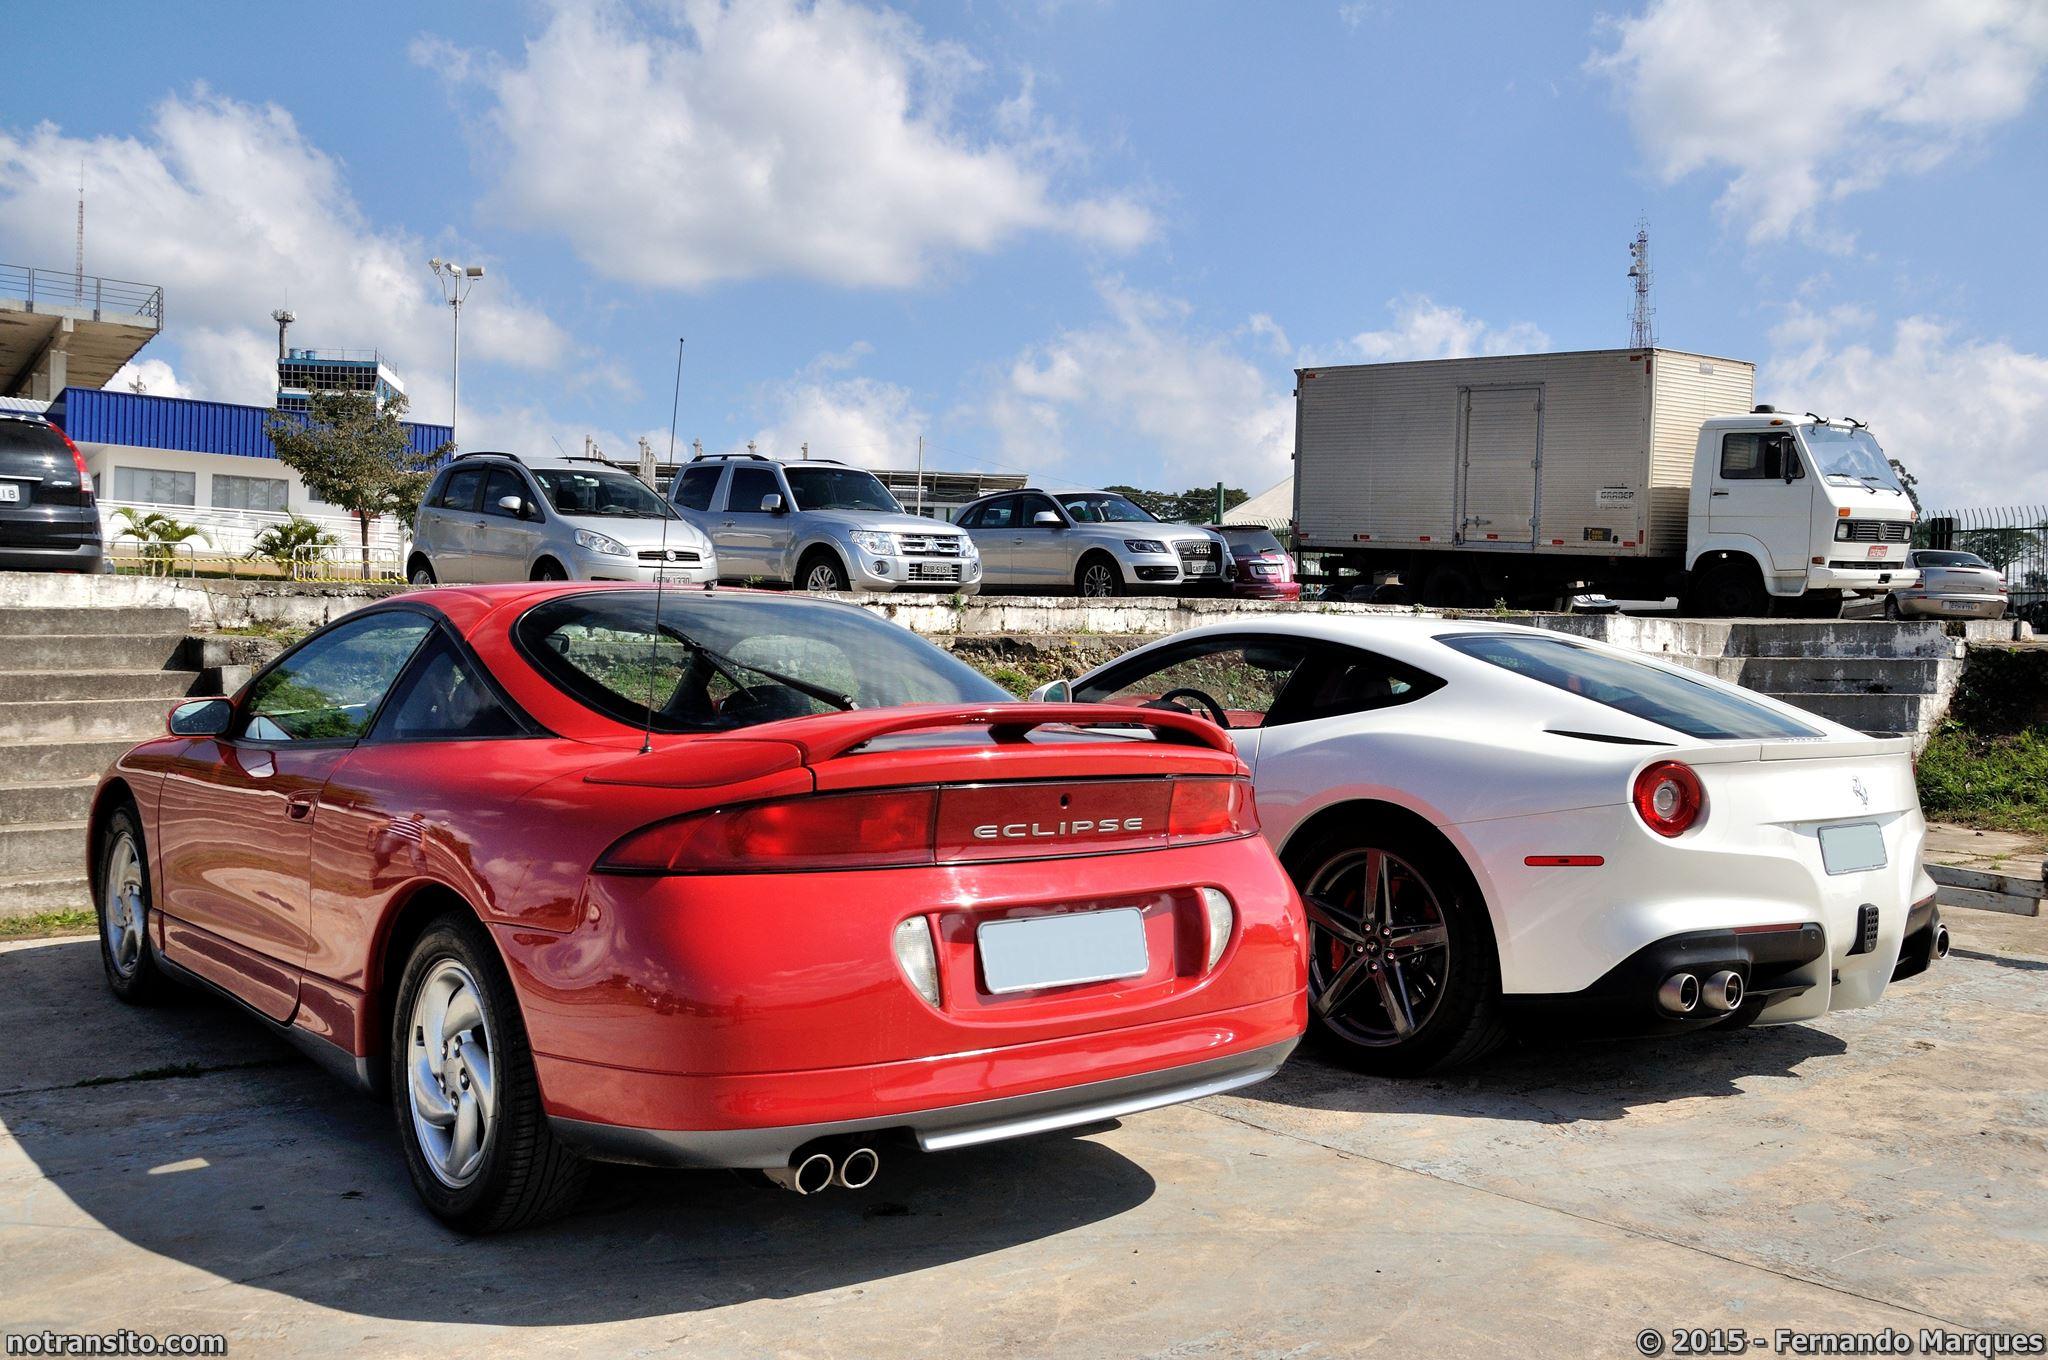 Ferrari f12berlinetta Bianco Fuji, Mistubishi Eclipse GS